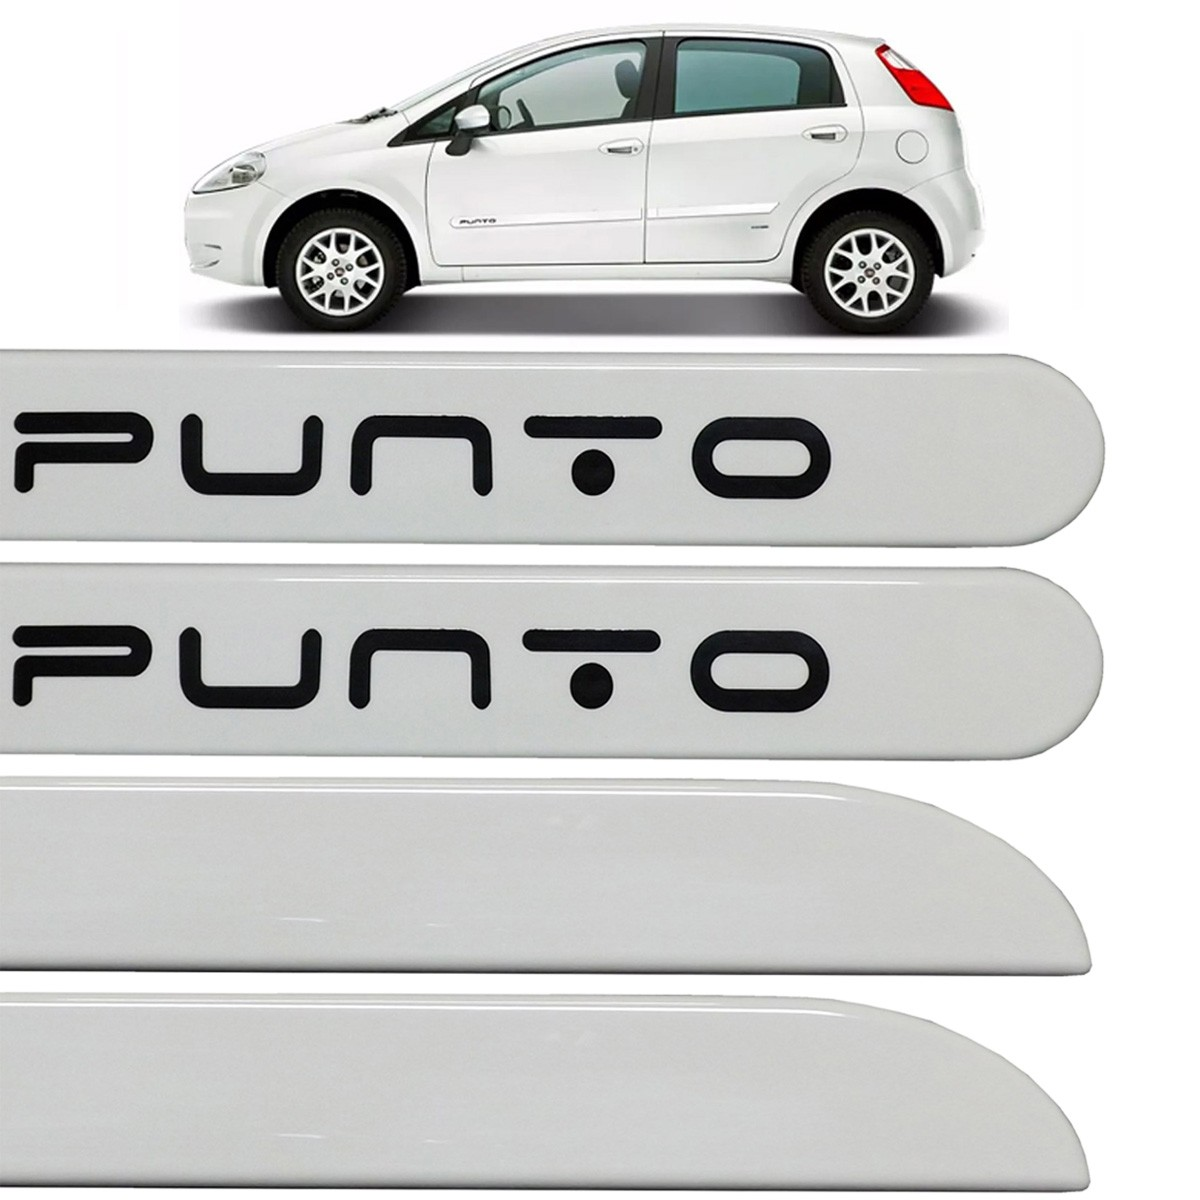 Jogo Friso Lateral Fiat Punto 2013 2014 2015 Branco Banchisa